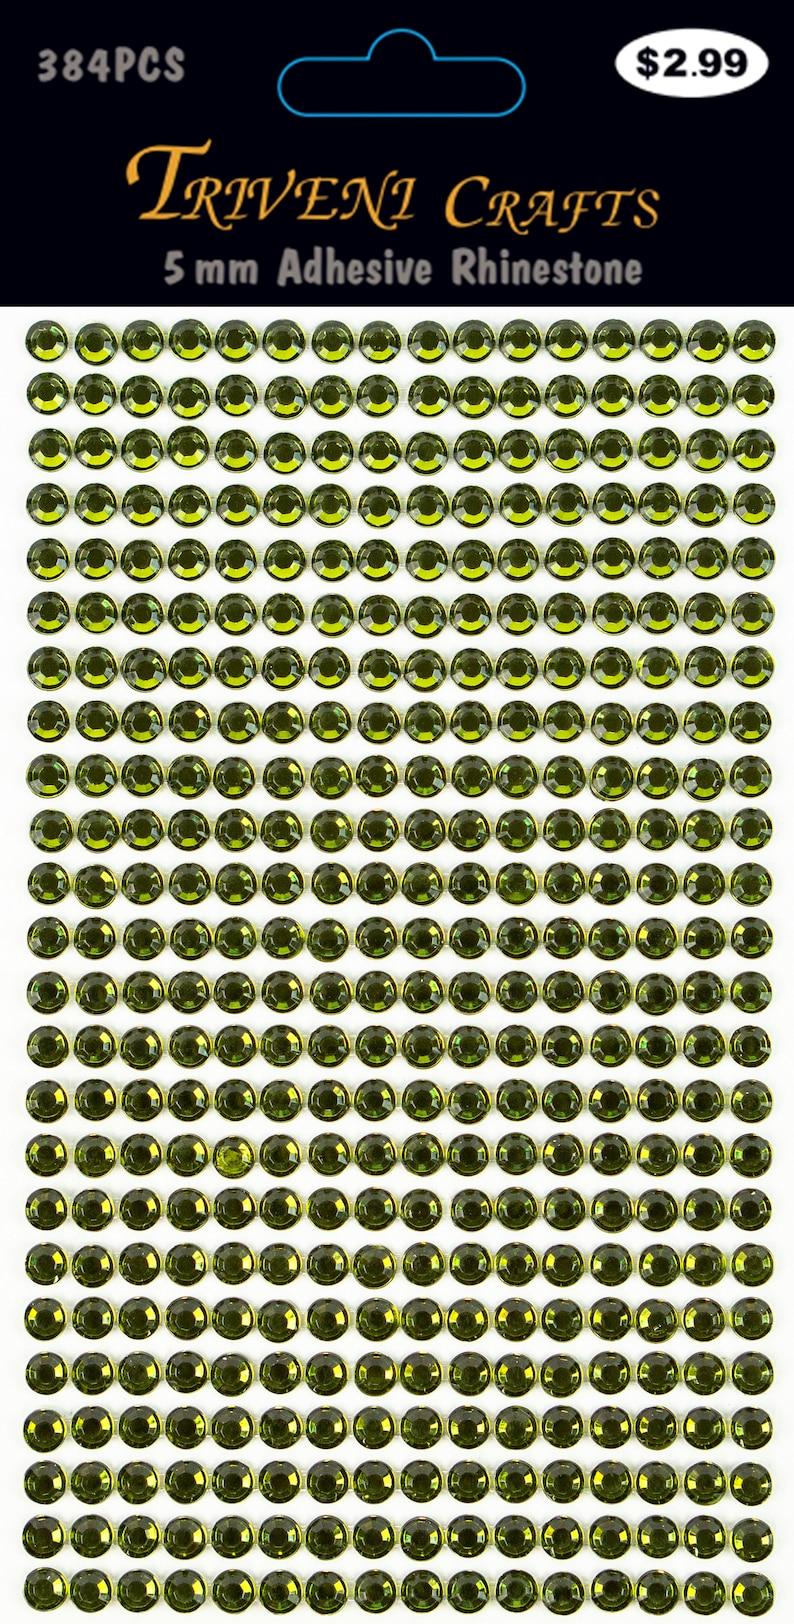 3 Sheets Olive 5mm Adhesive Rhinestone Dot Sticker